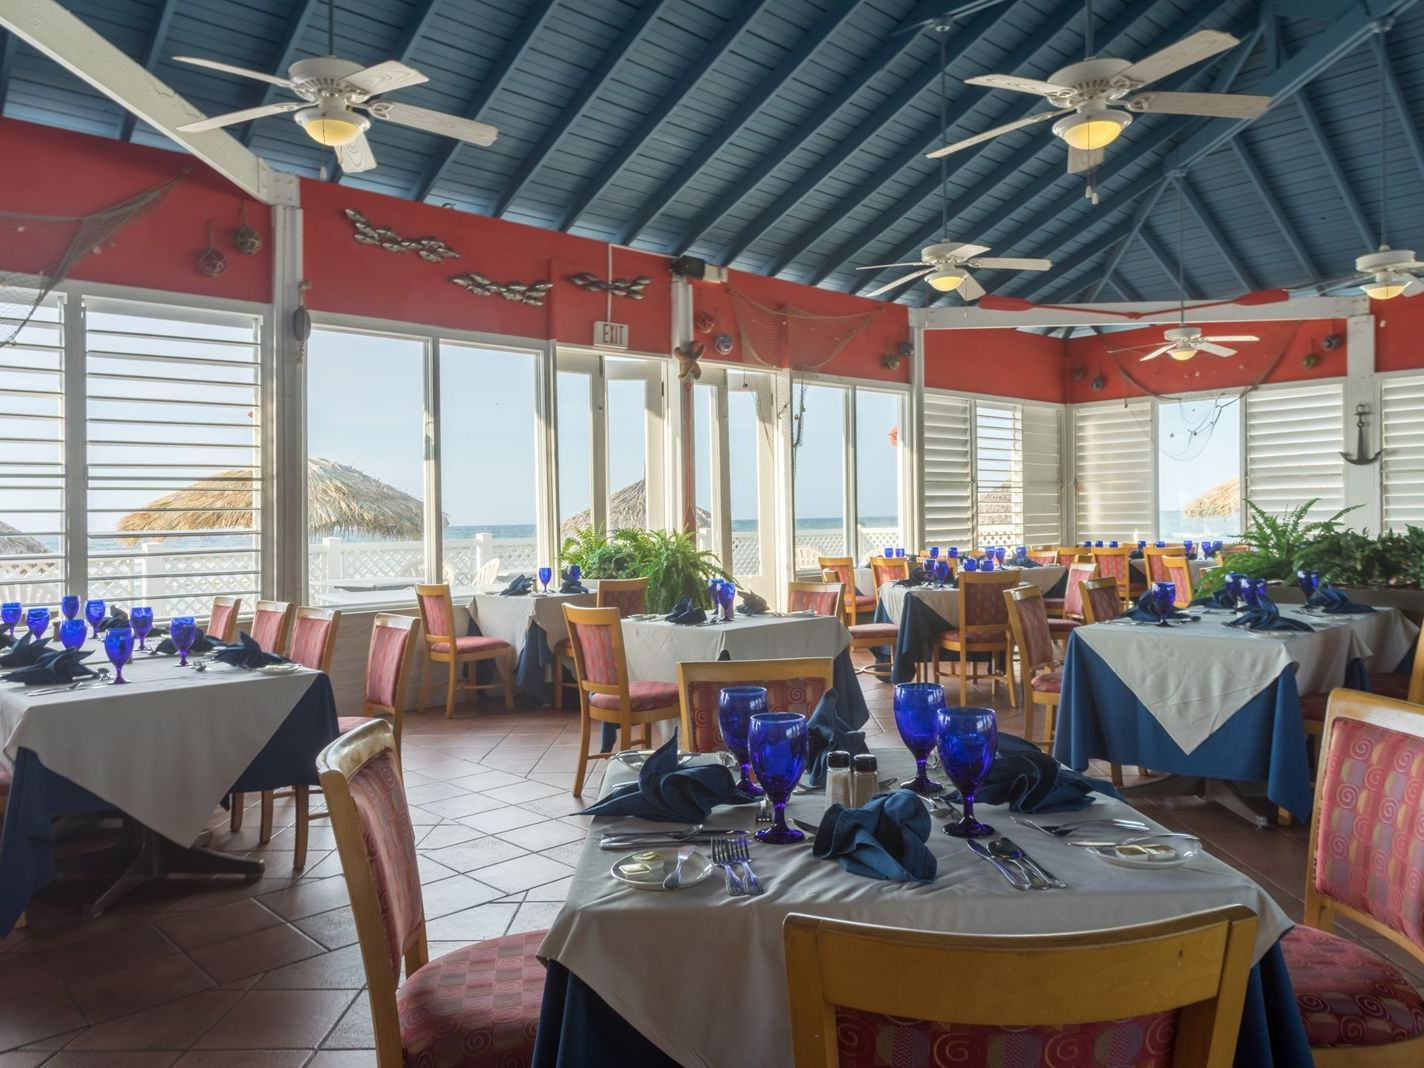 Seabreeze Restaurant Table setting at Holiday Inn Montego Bay